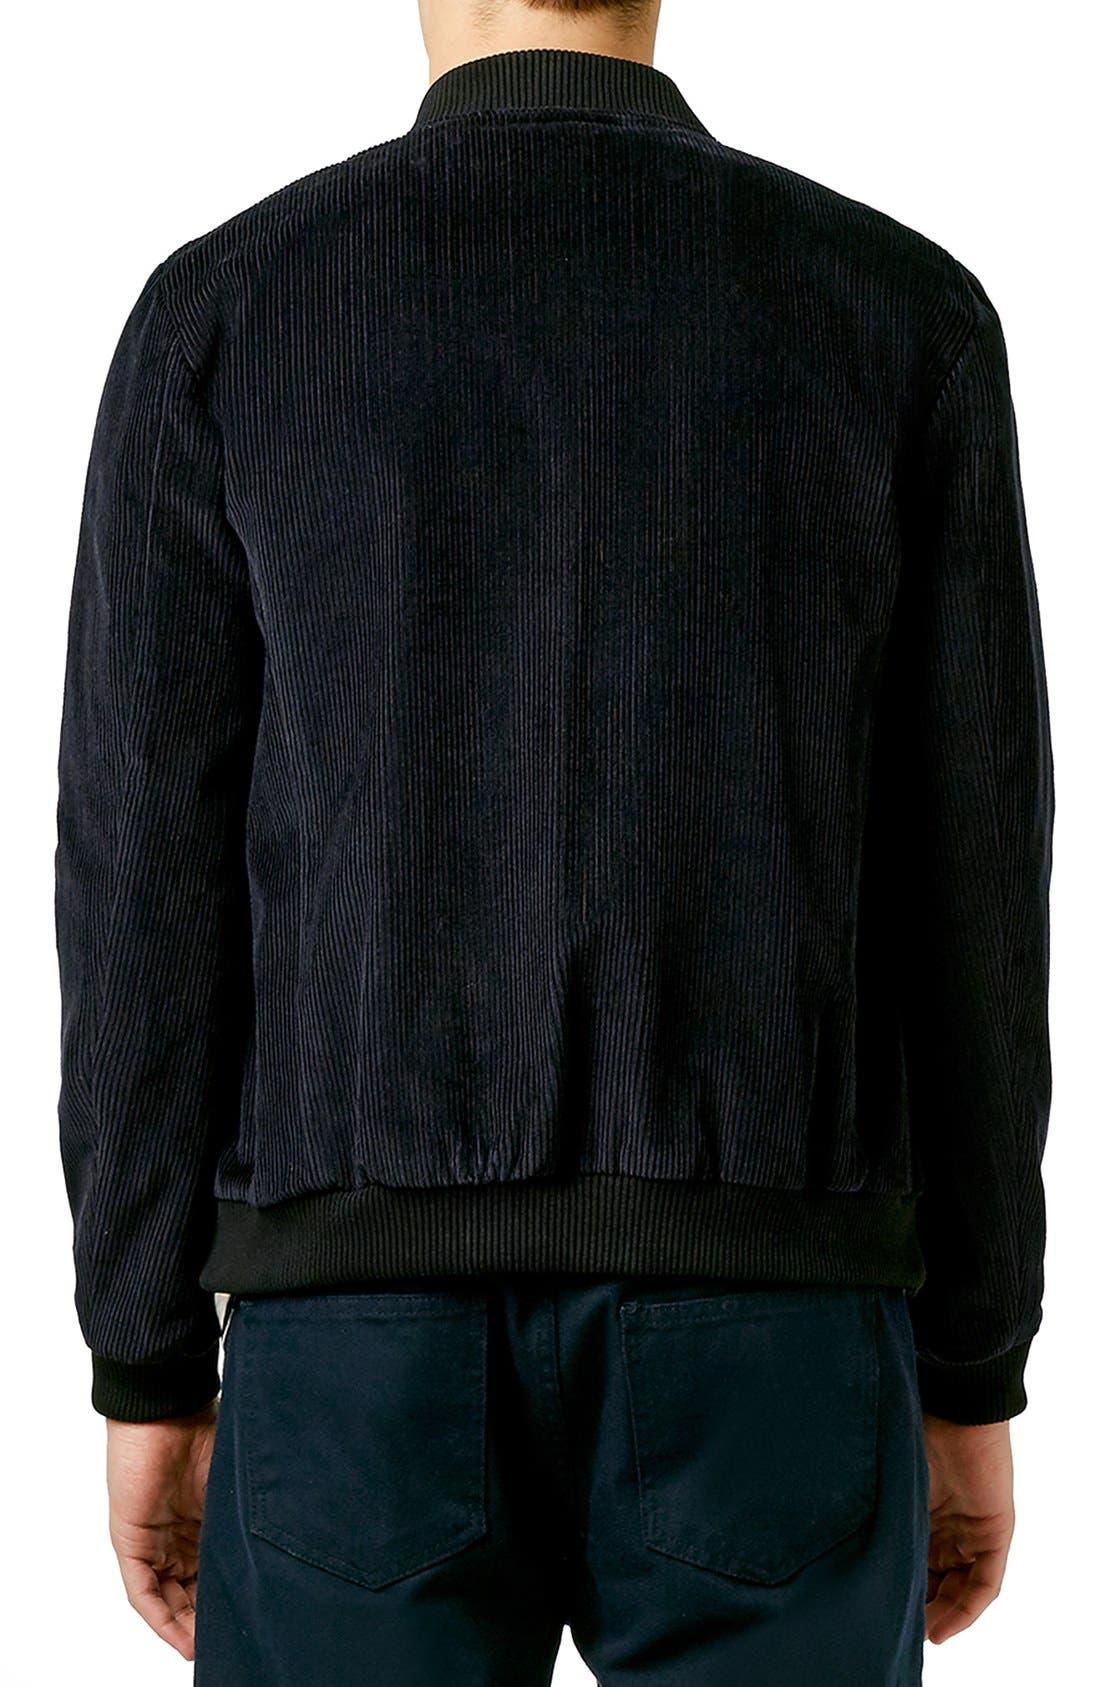 TOPMAN,                             Tailored Black Corduroy Bomber Jacket,                             Alternate thumbnail 2, color,                             001